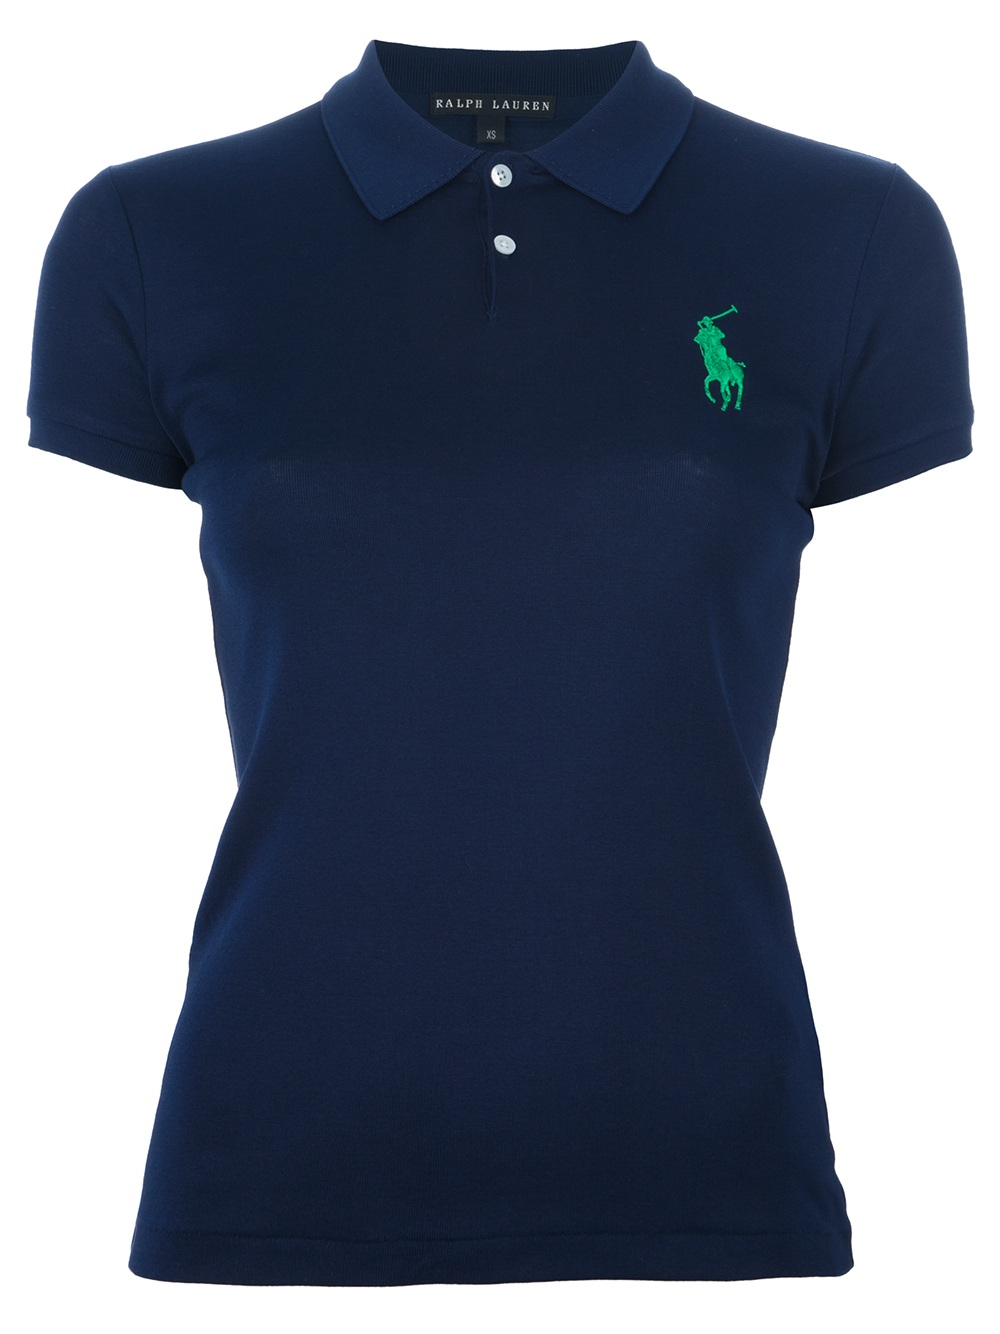 Ralph lauren black label logo polo shirt in blue navy lyst for Ralph lauren black label polo shirt